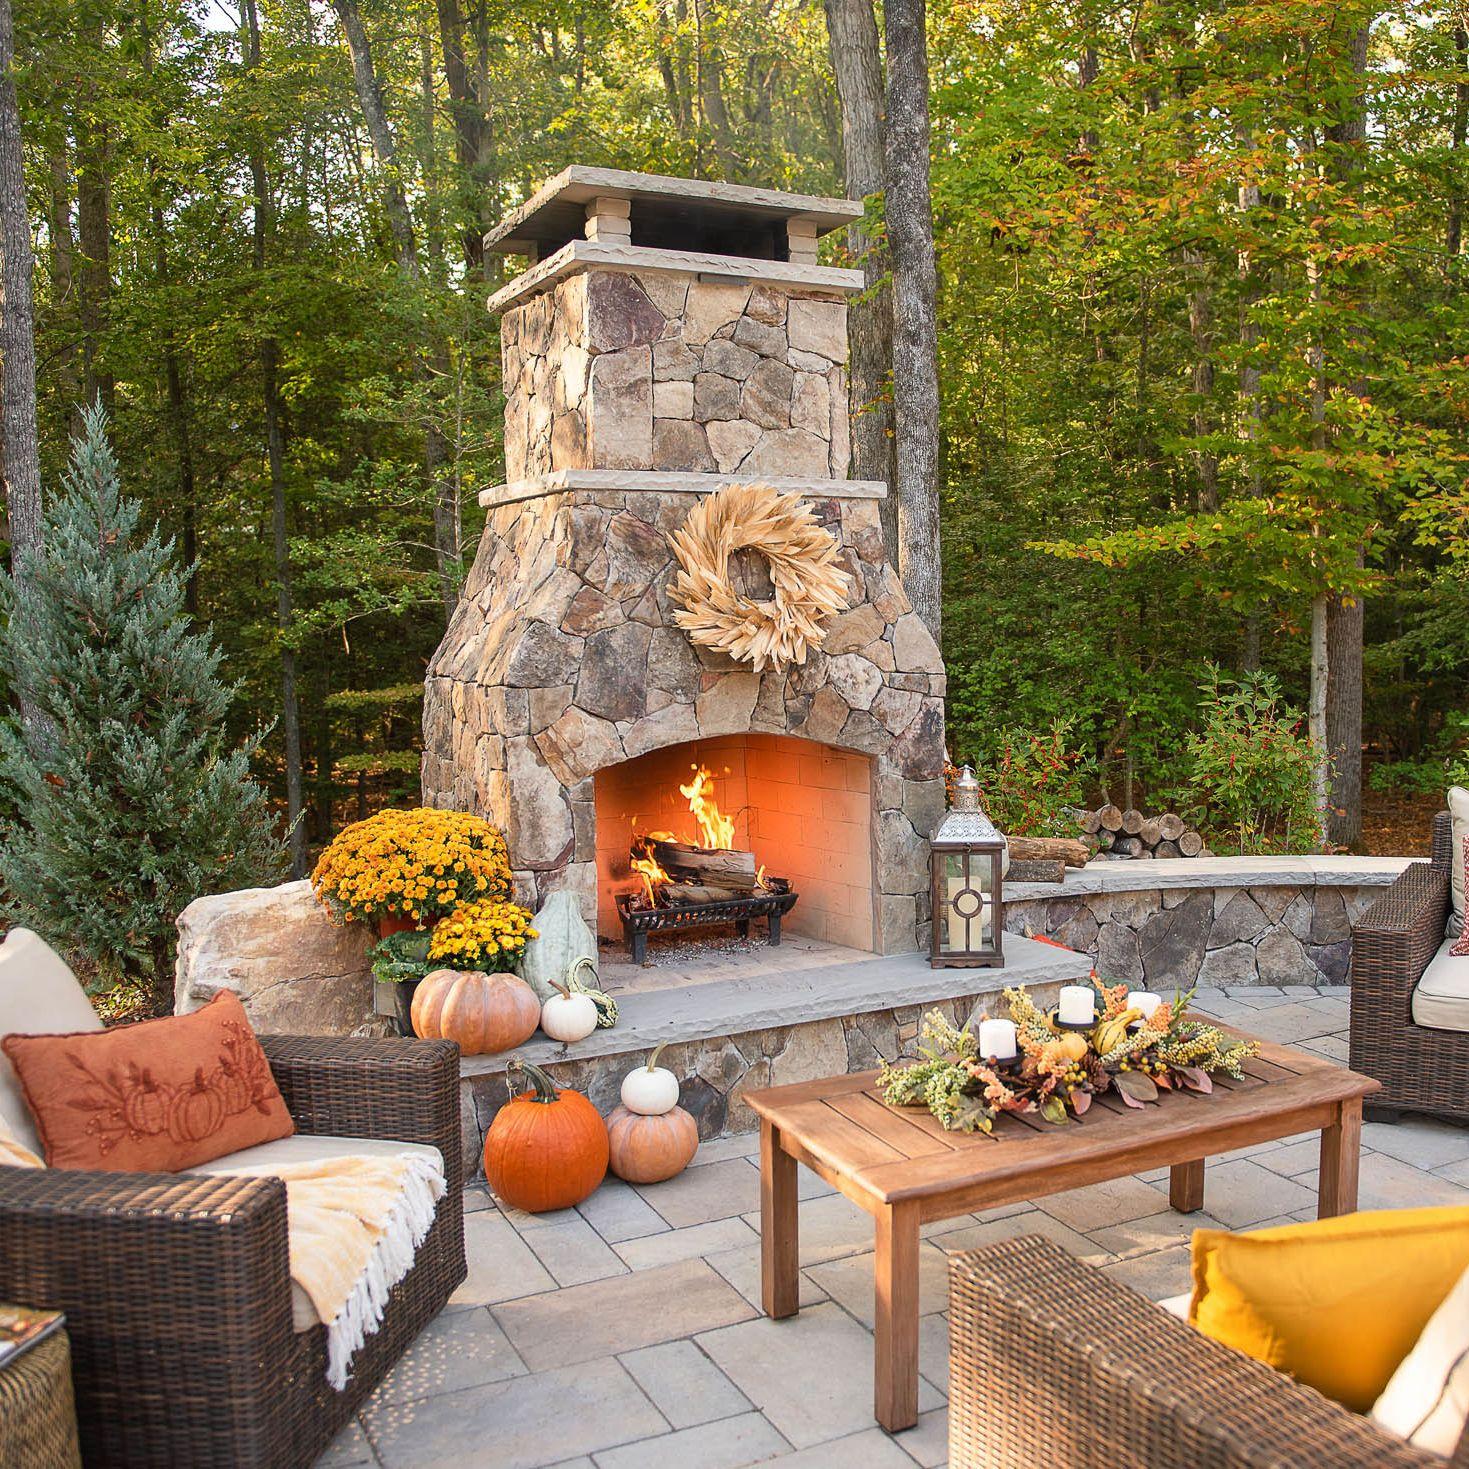 A Backyard for Every Season